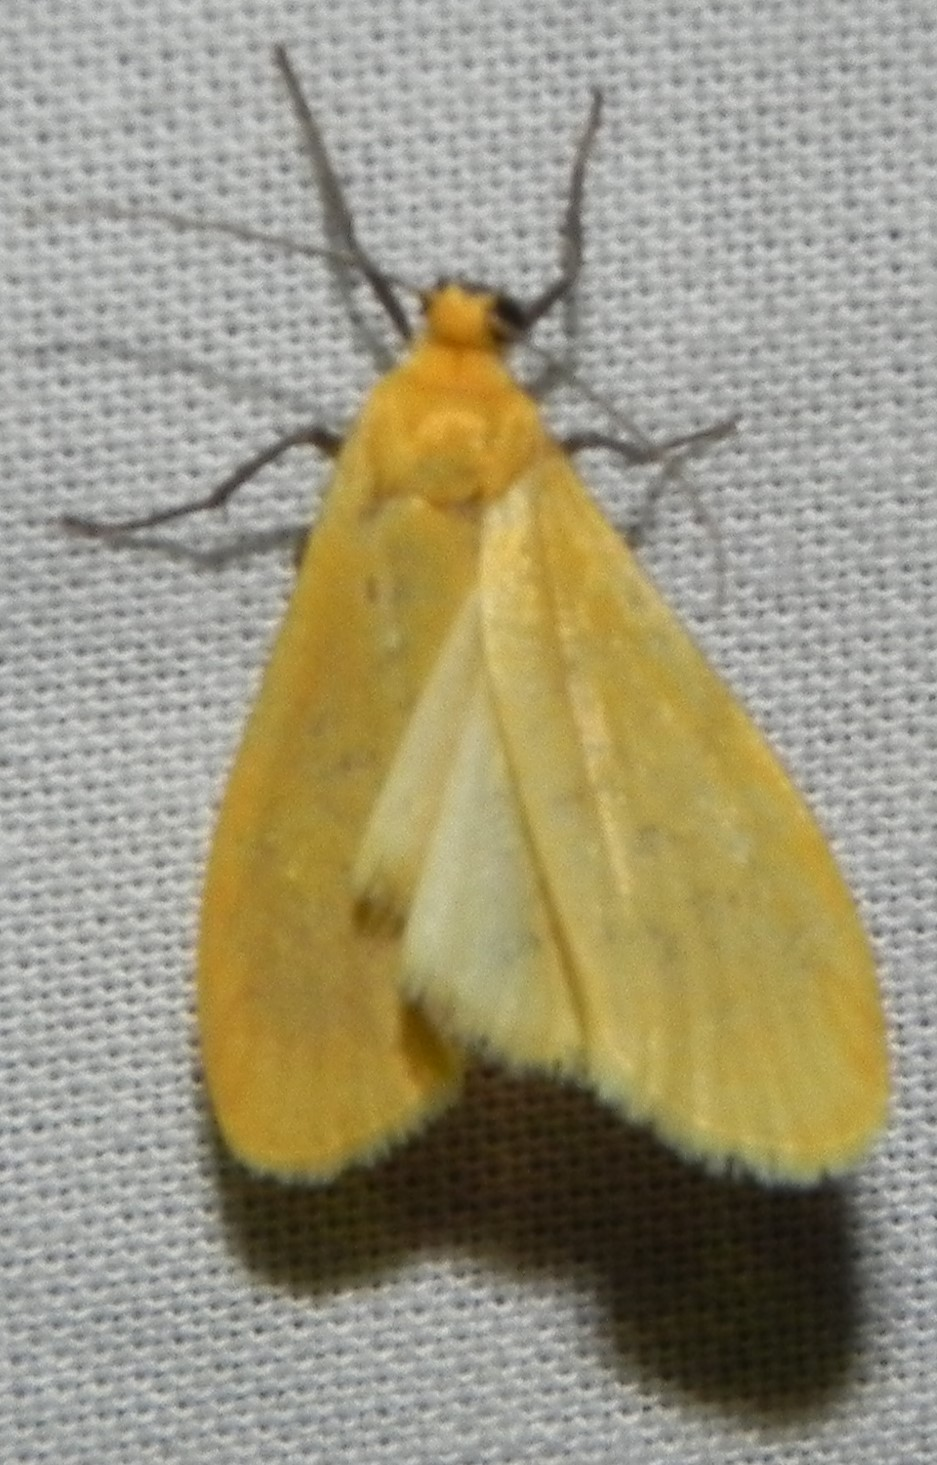 [Eilema sororcula] Manteau jaune? 311